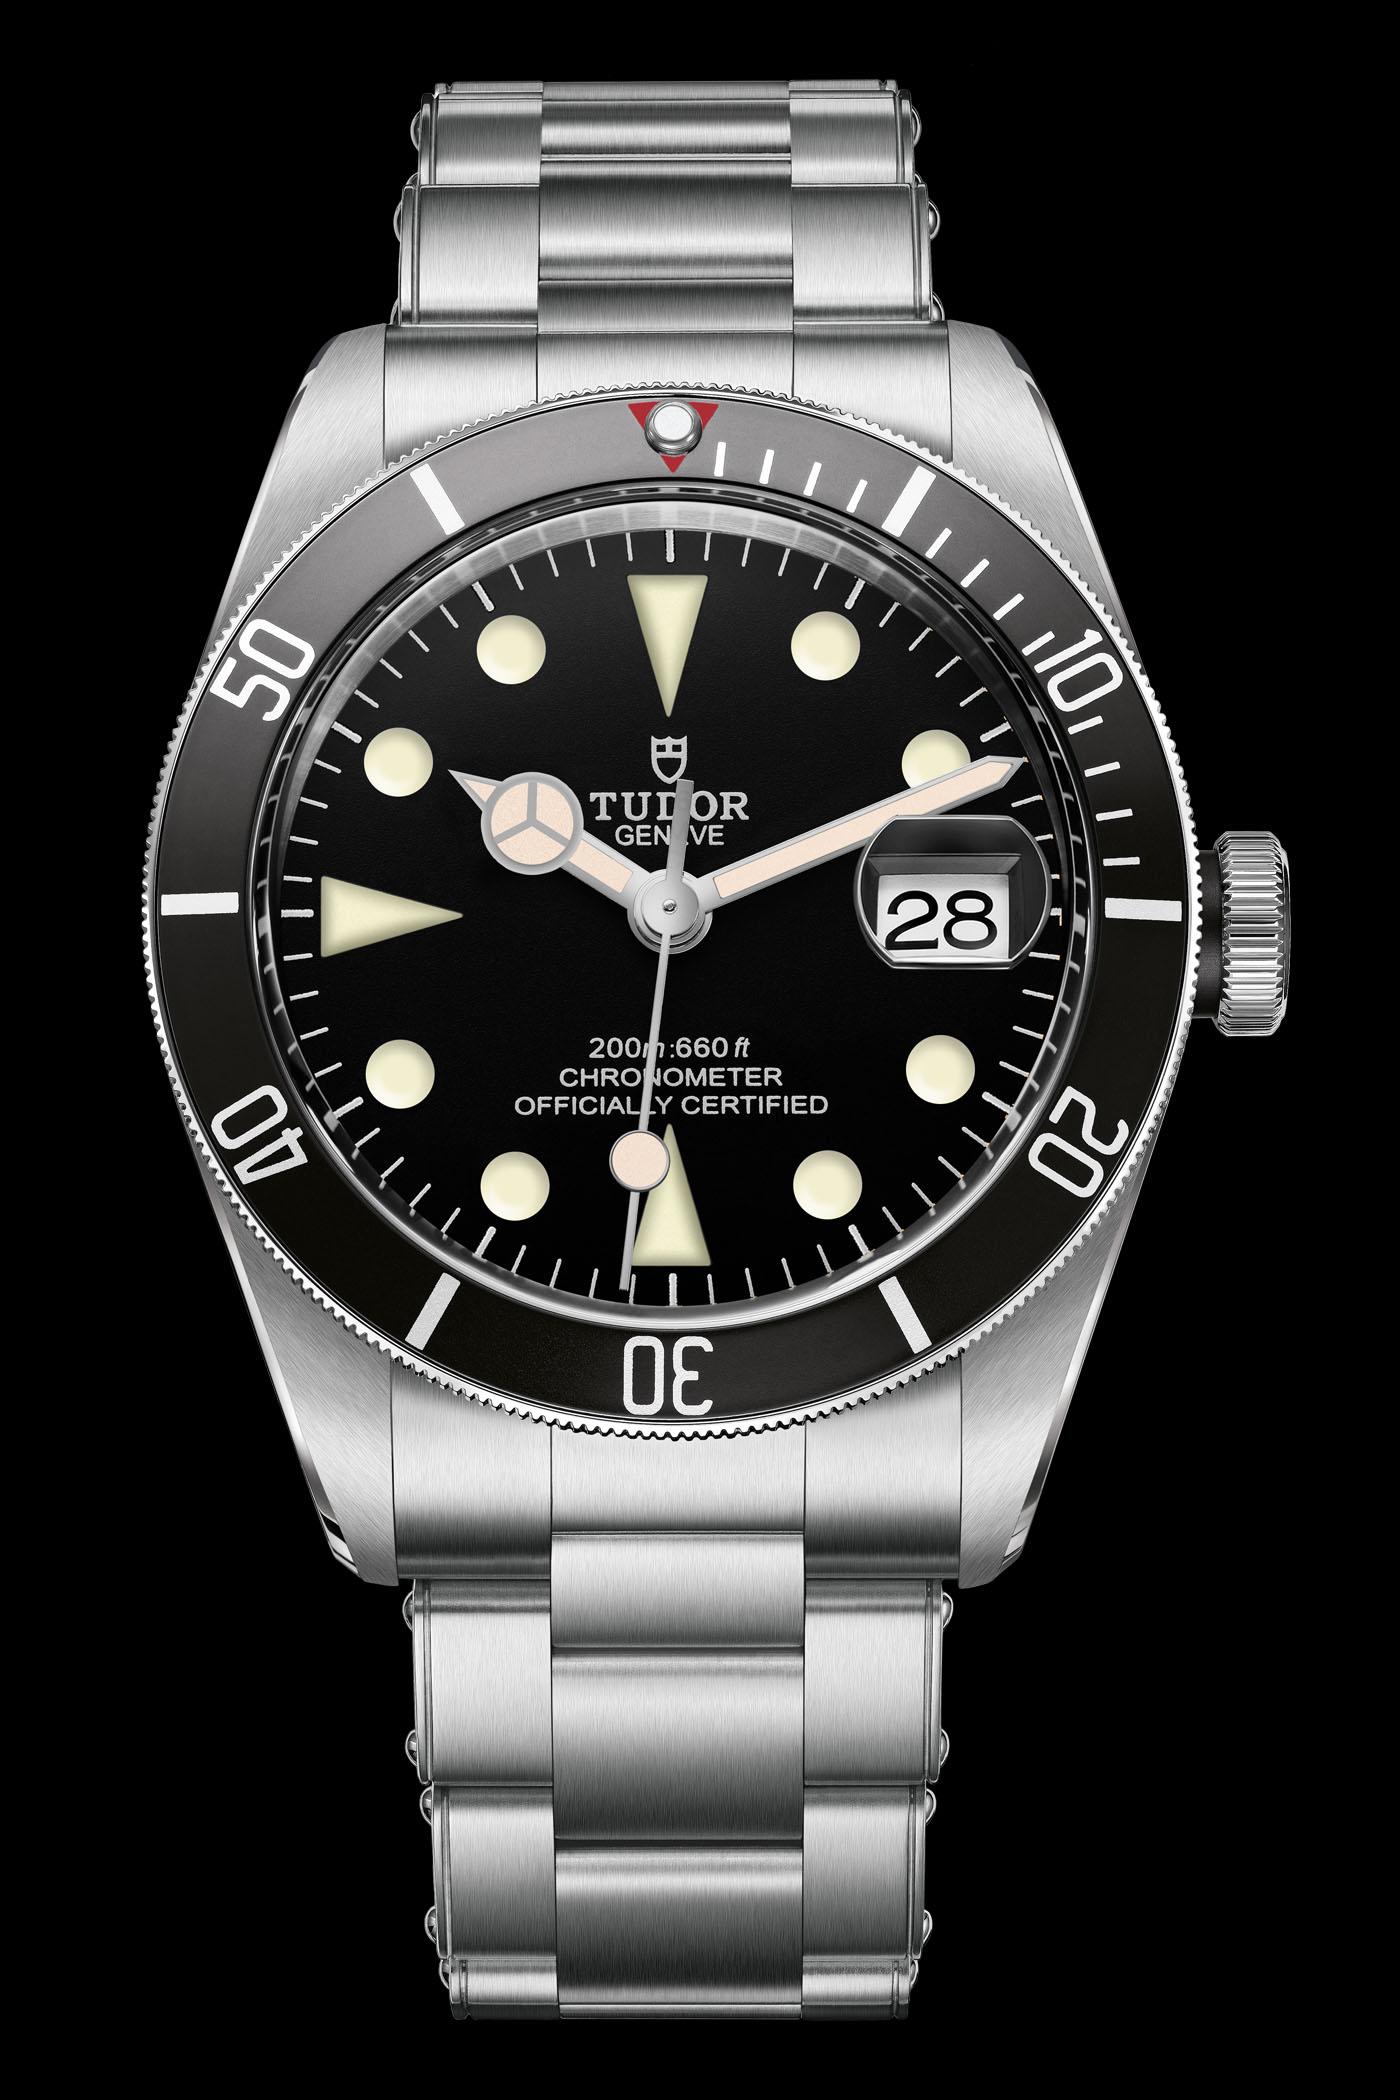 2019 Tudor OysterDate Submariner revival - Tudor Baselworld 2019 - Tudor 2019 Predictions - 14